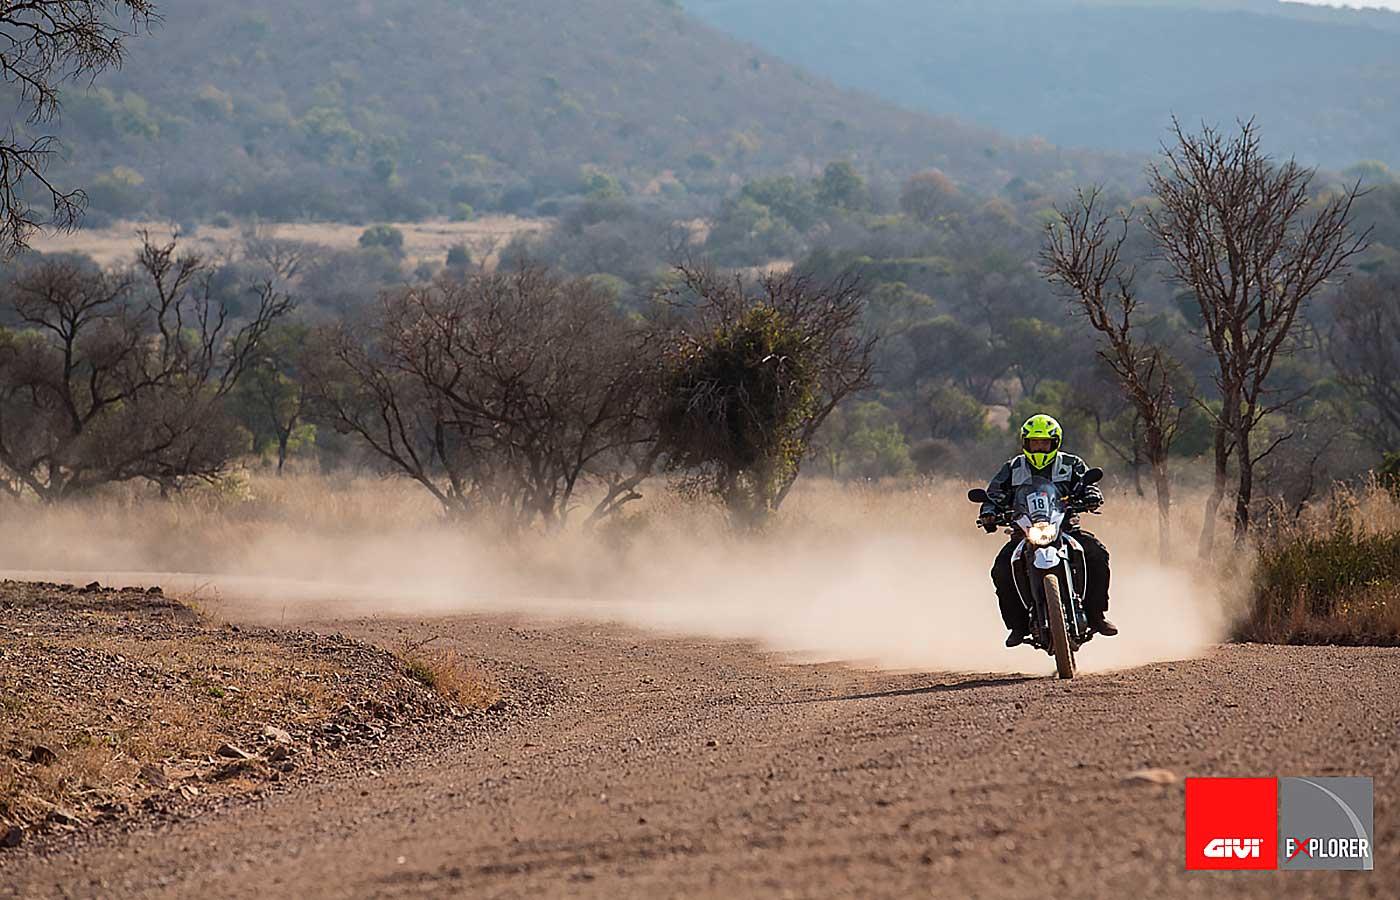 WILDERNESS ADVENTURE SOUTH AFRICA - Givi Explorer